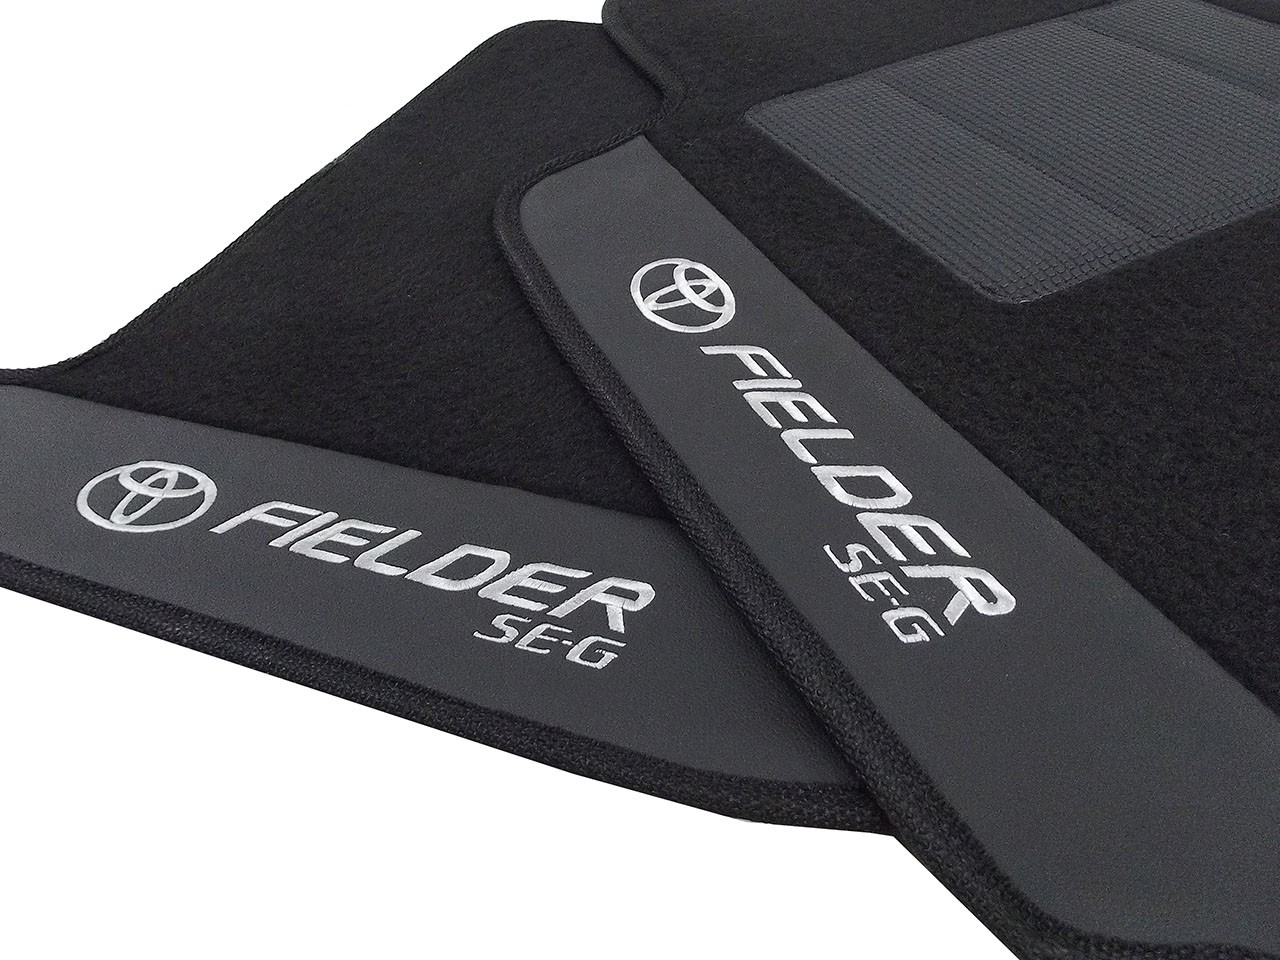 Tapete Toyota Fielder Carpete  Premium Base Pinada